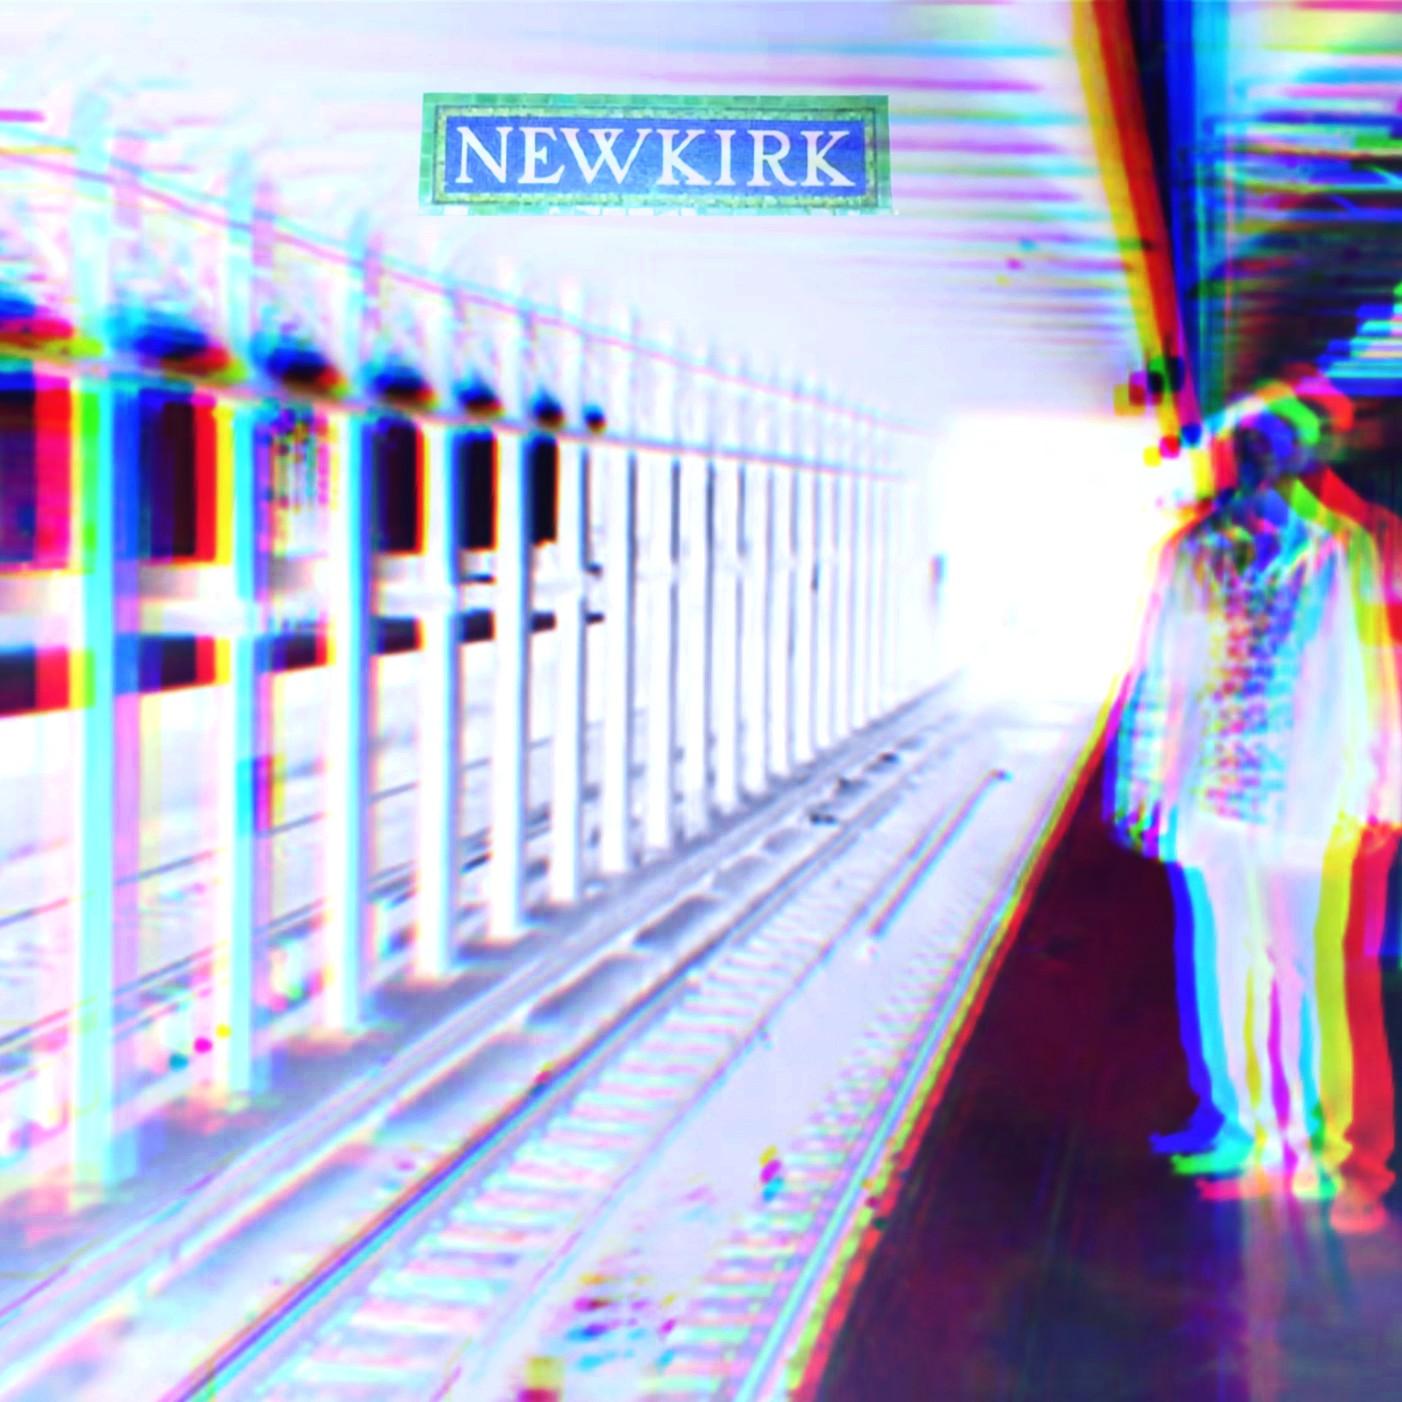 Newkirk EP 2